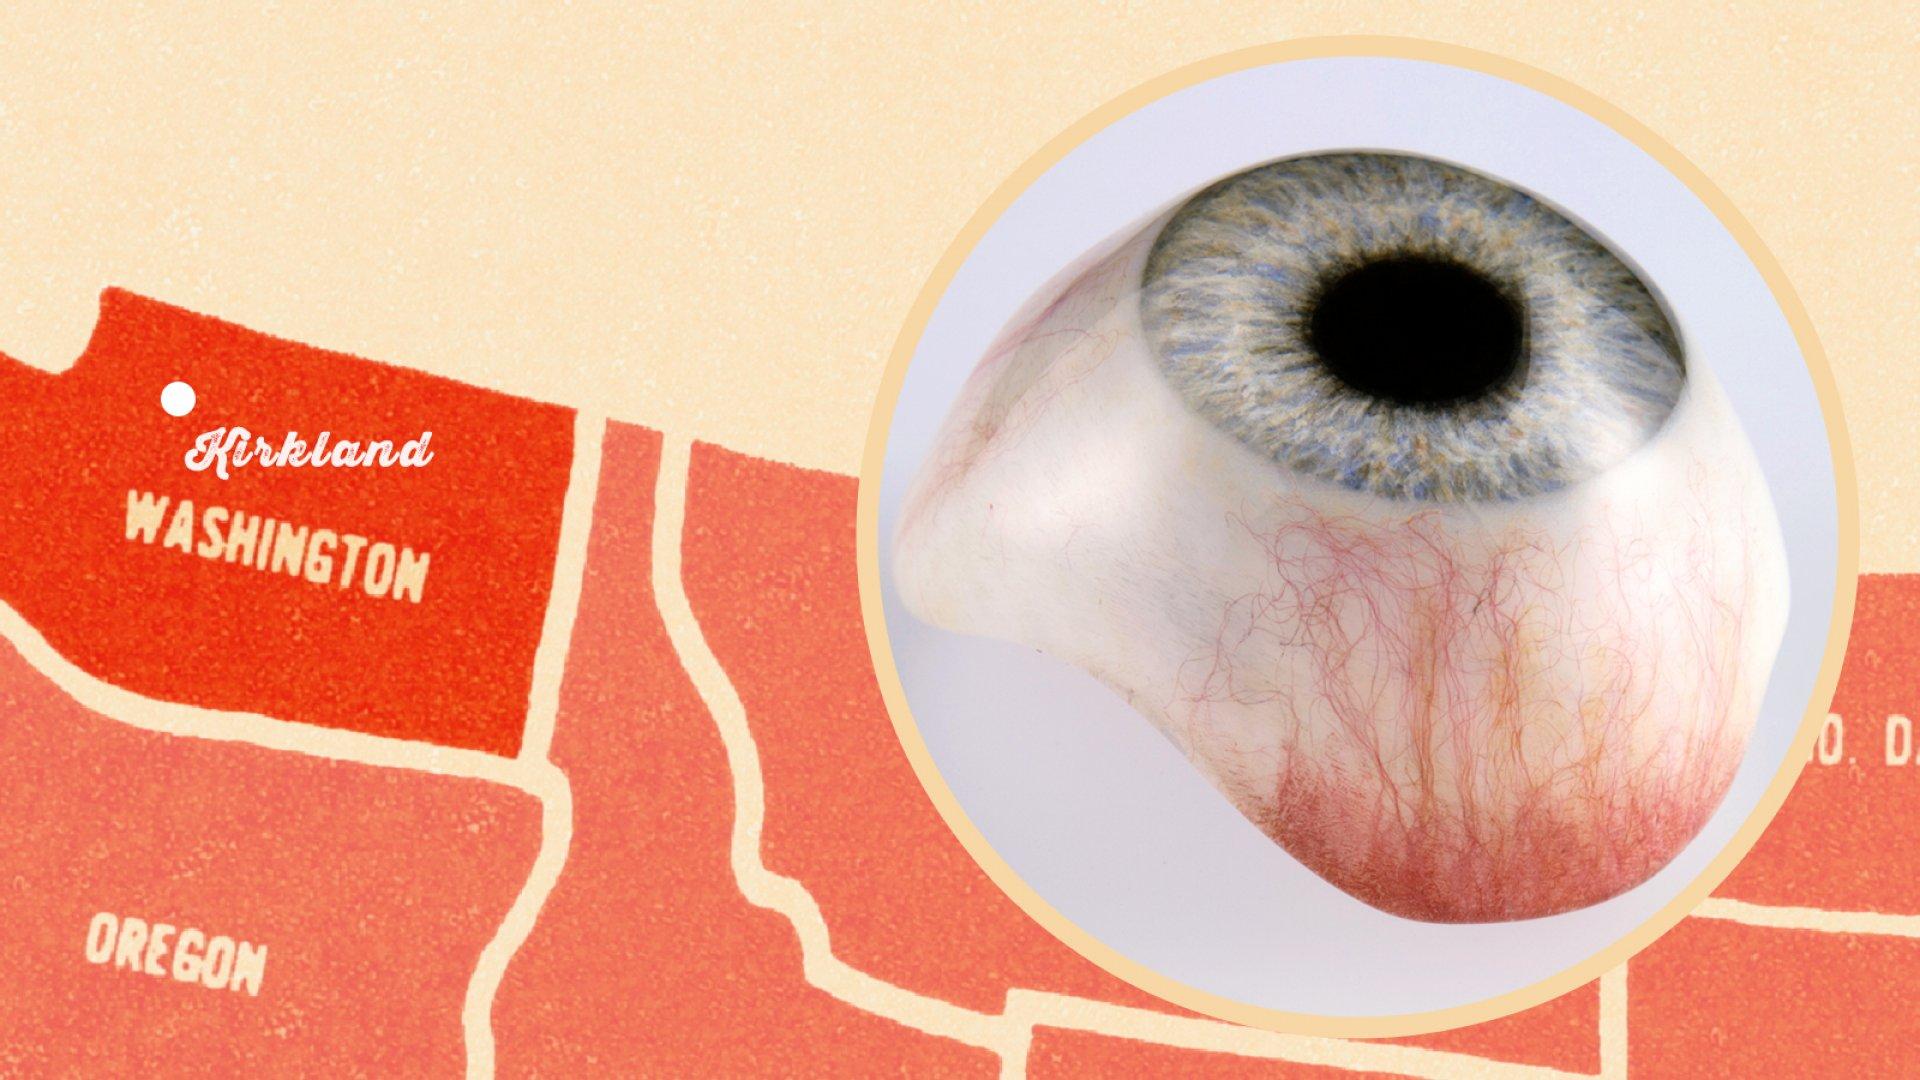 This Company Makes Fake Human Eyeballs an Art Form